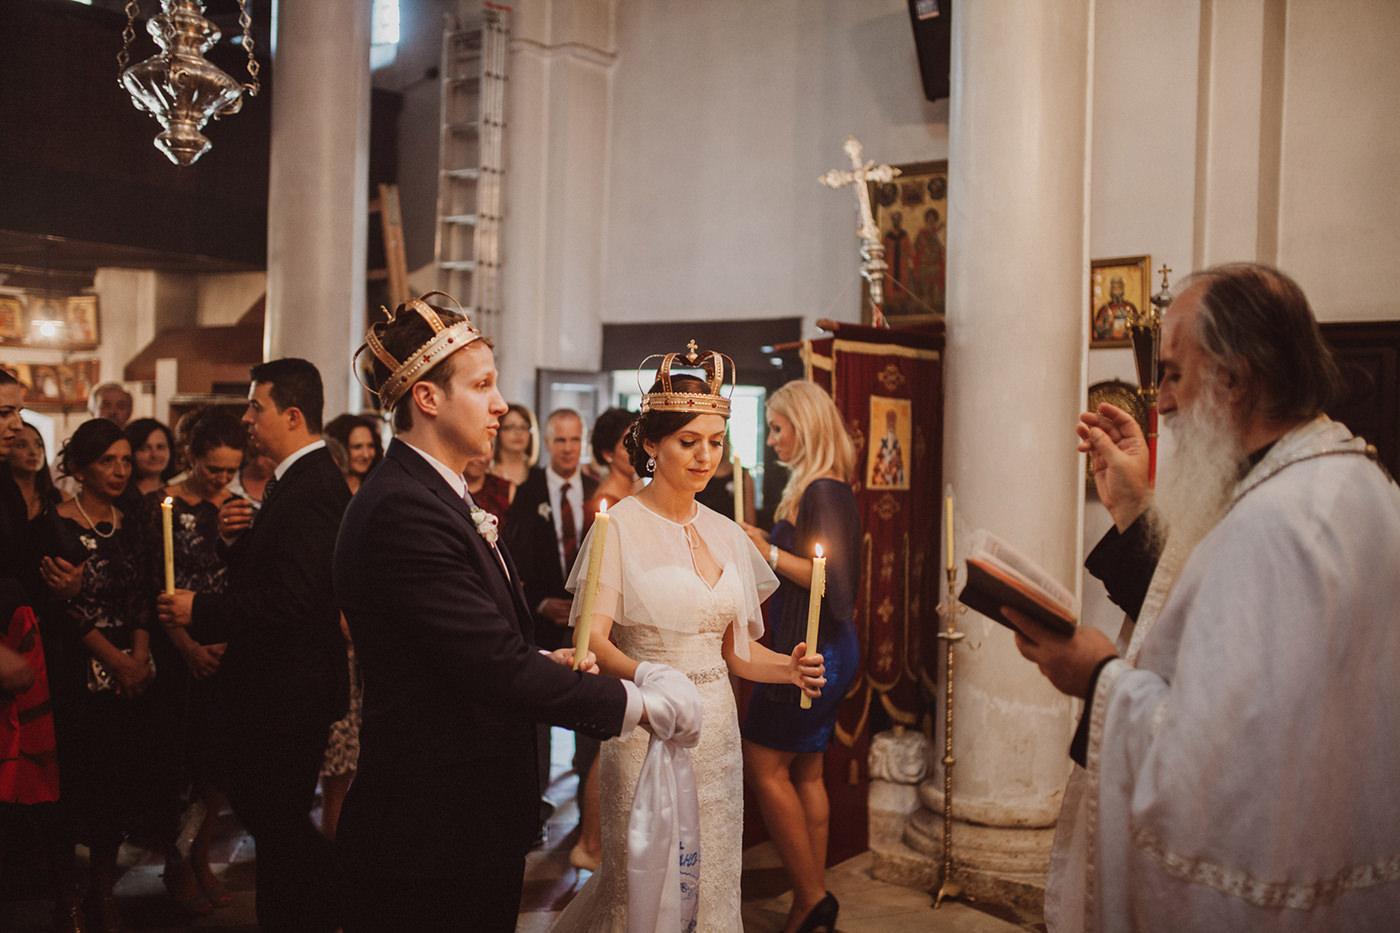 irena-ryan-destination-wedding-photographer-montenegro-kotor-0109